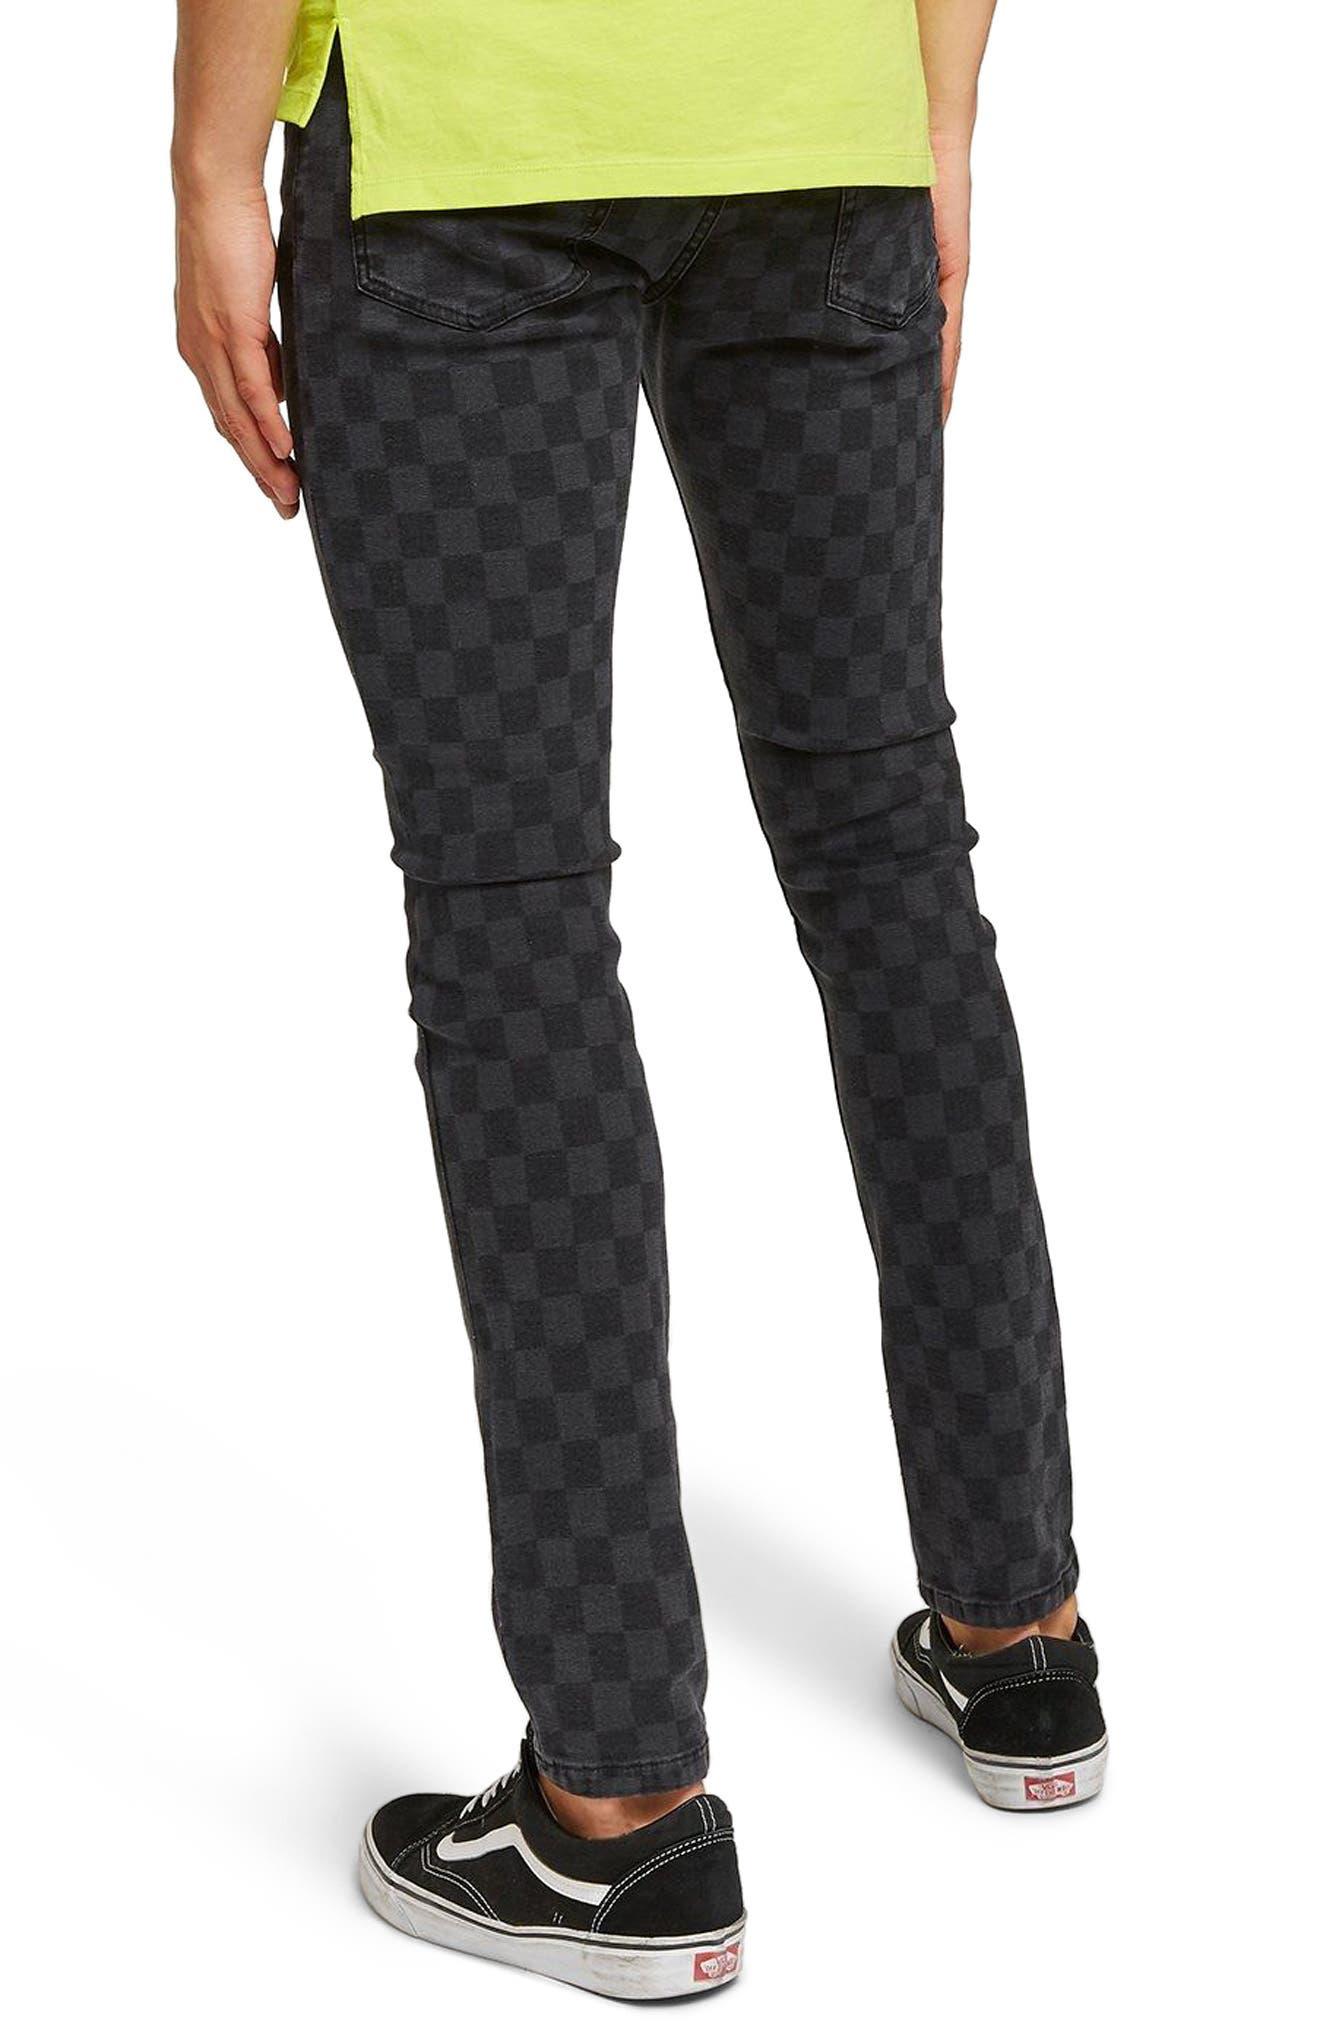 Check Stretch Skinny Fit Pants,                             Alternate thumbnail 2, color,                             Black Multi